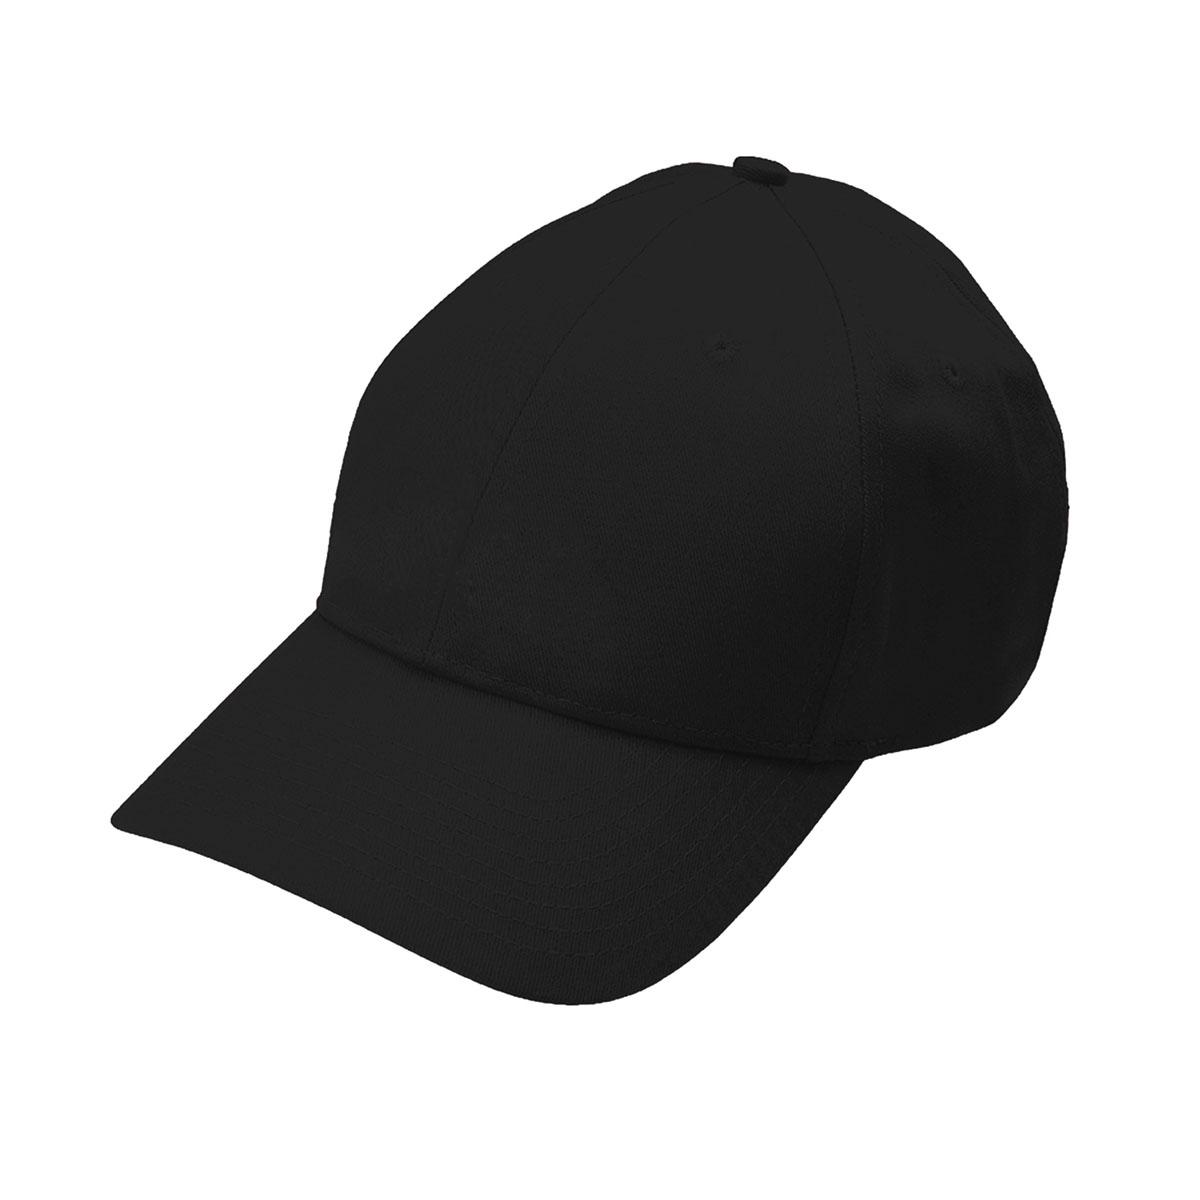 Black eco cotton cap